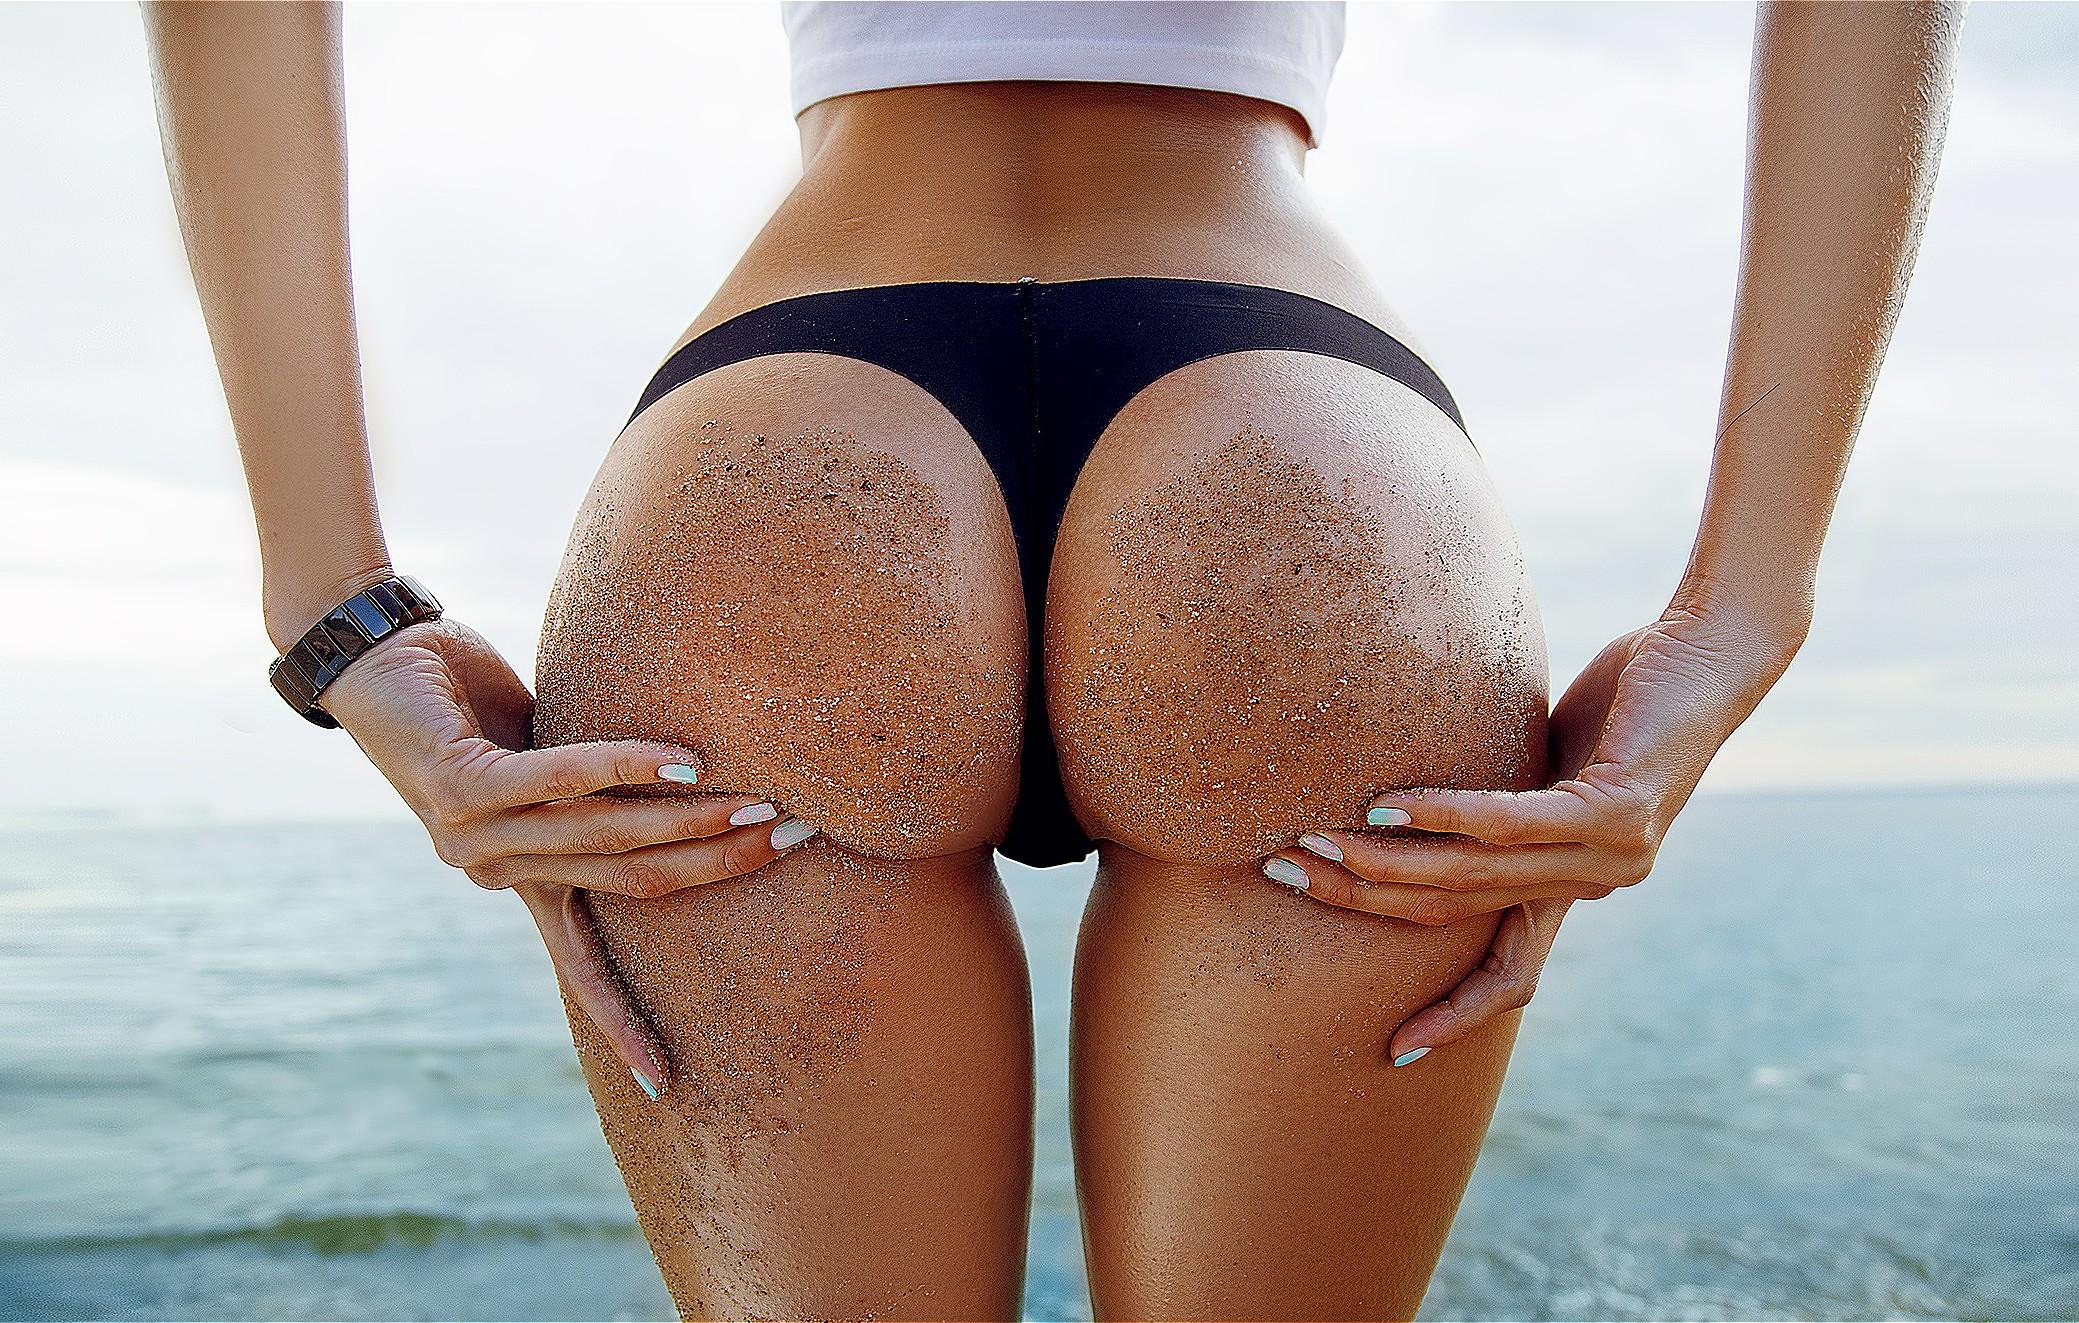 Download 2079x1323 ass, sand covered, hands on ass, sea